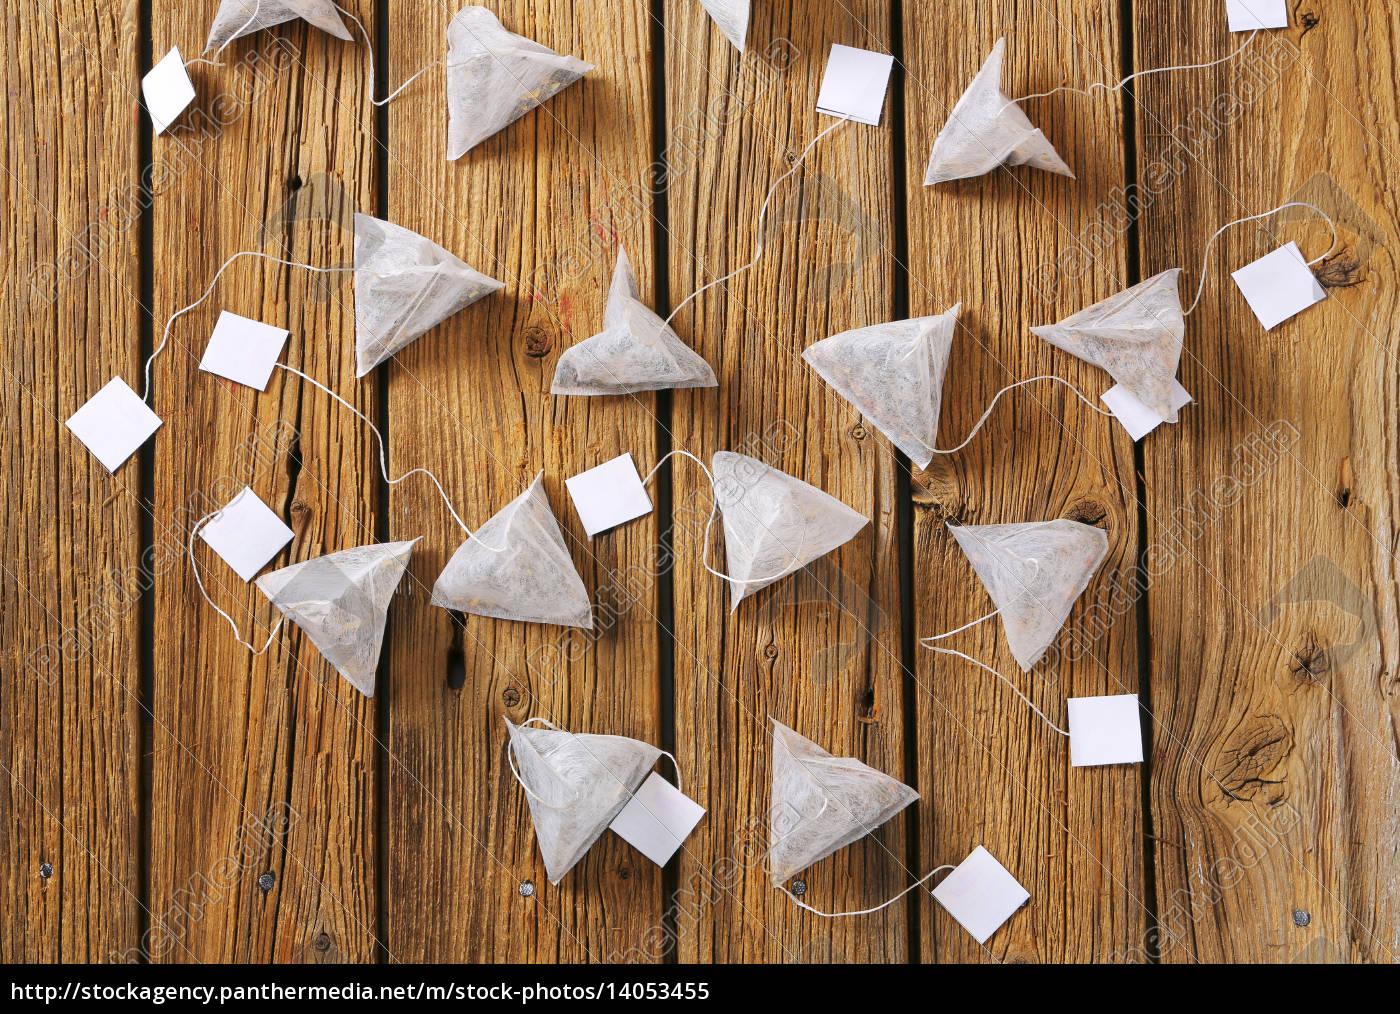 pyramid, tea, bags - 14053455